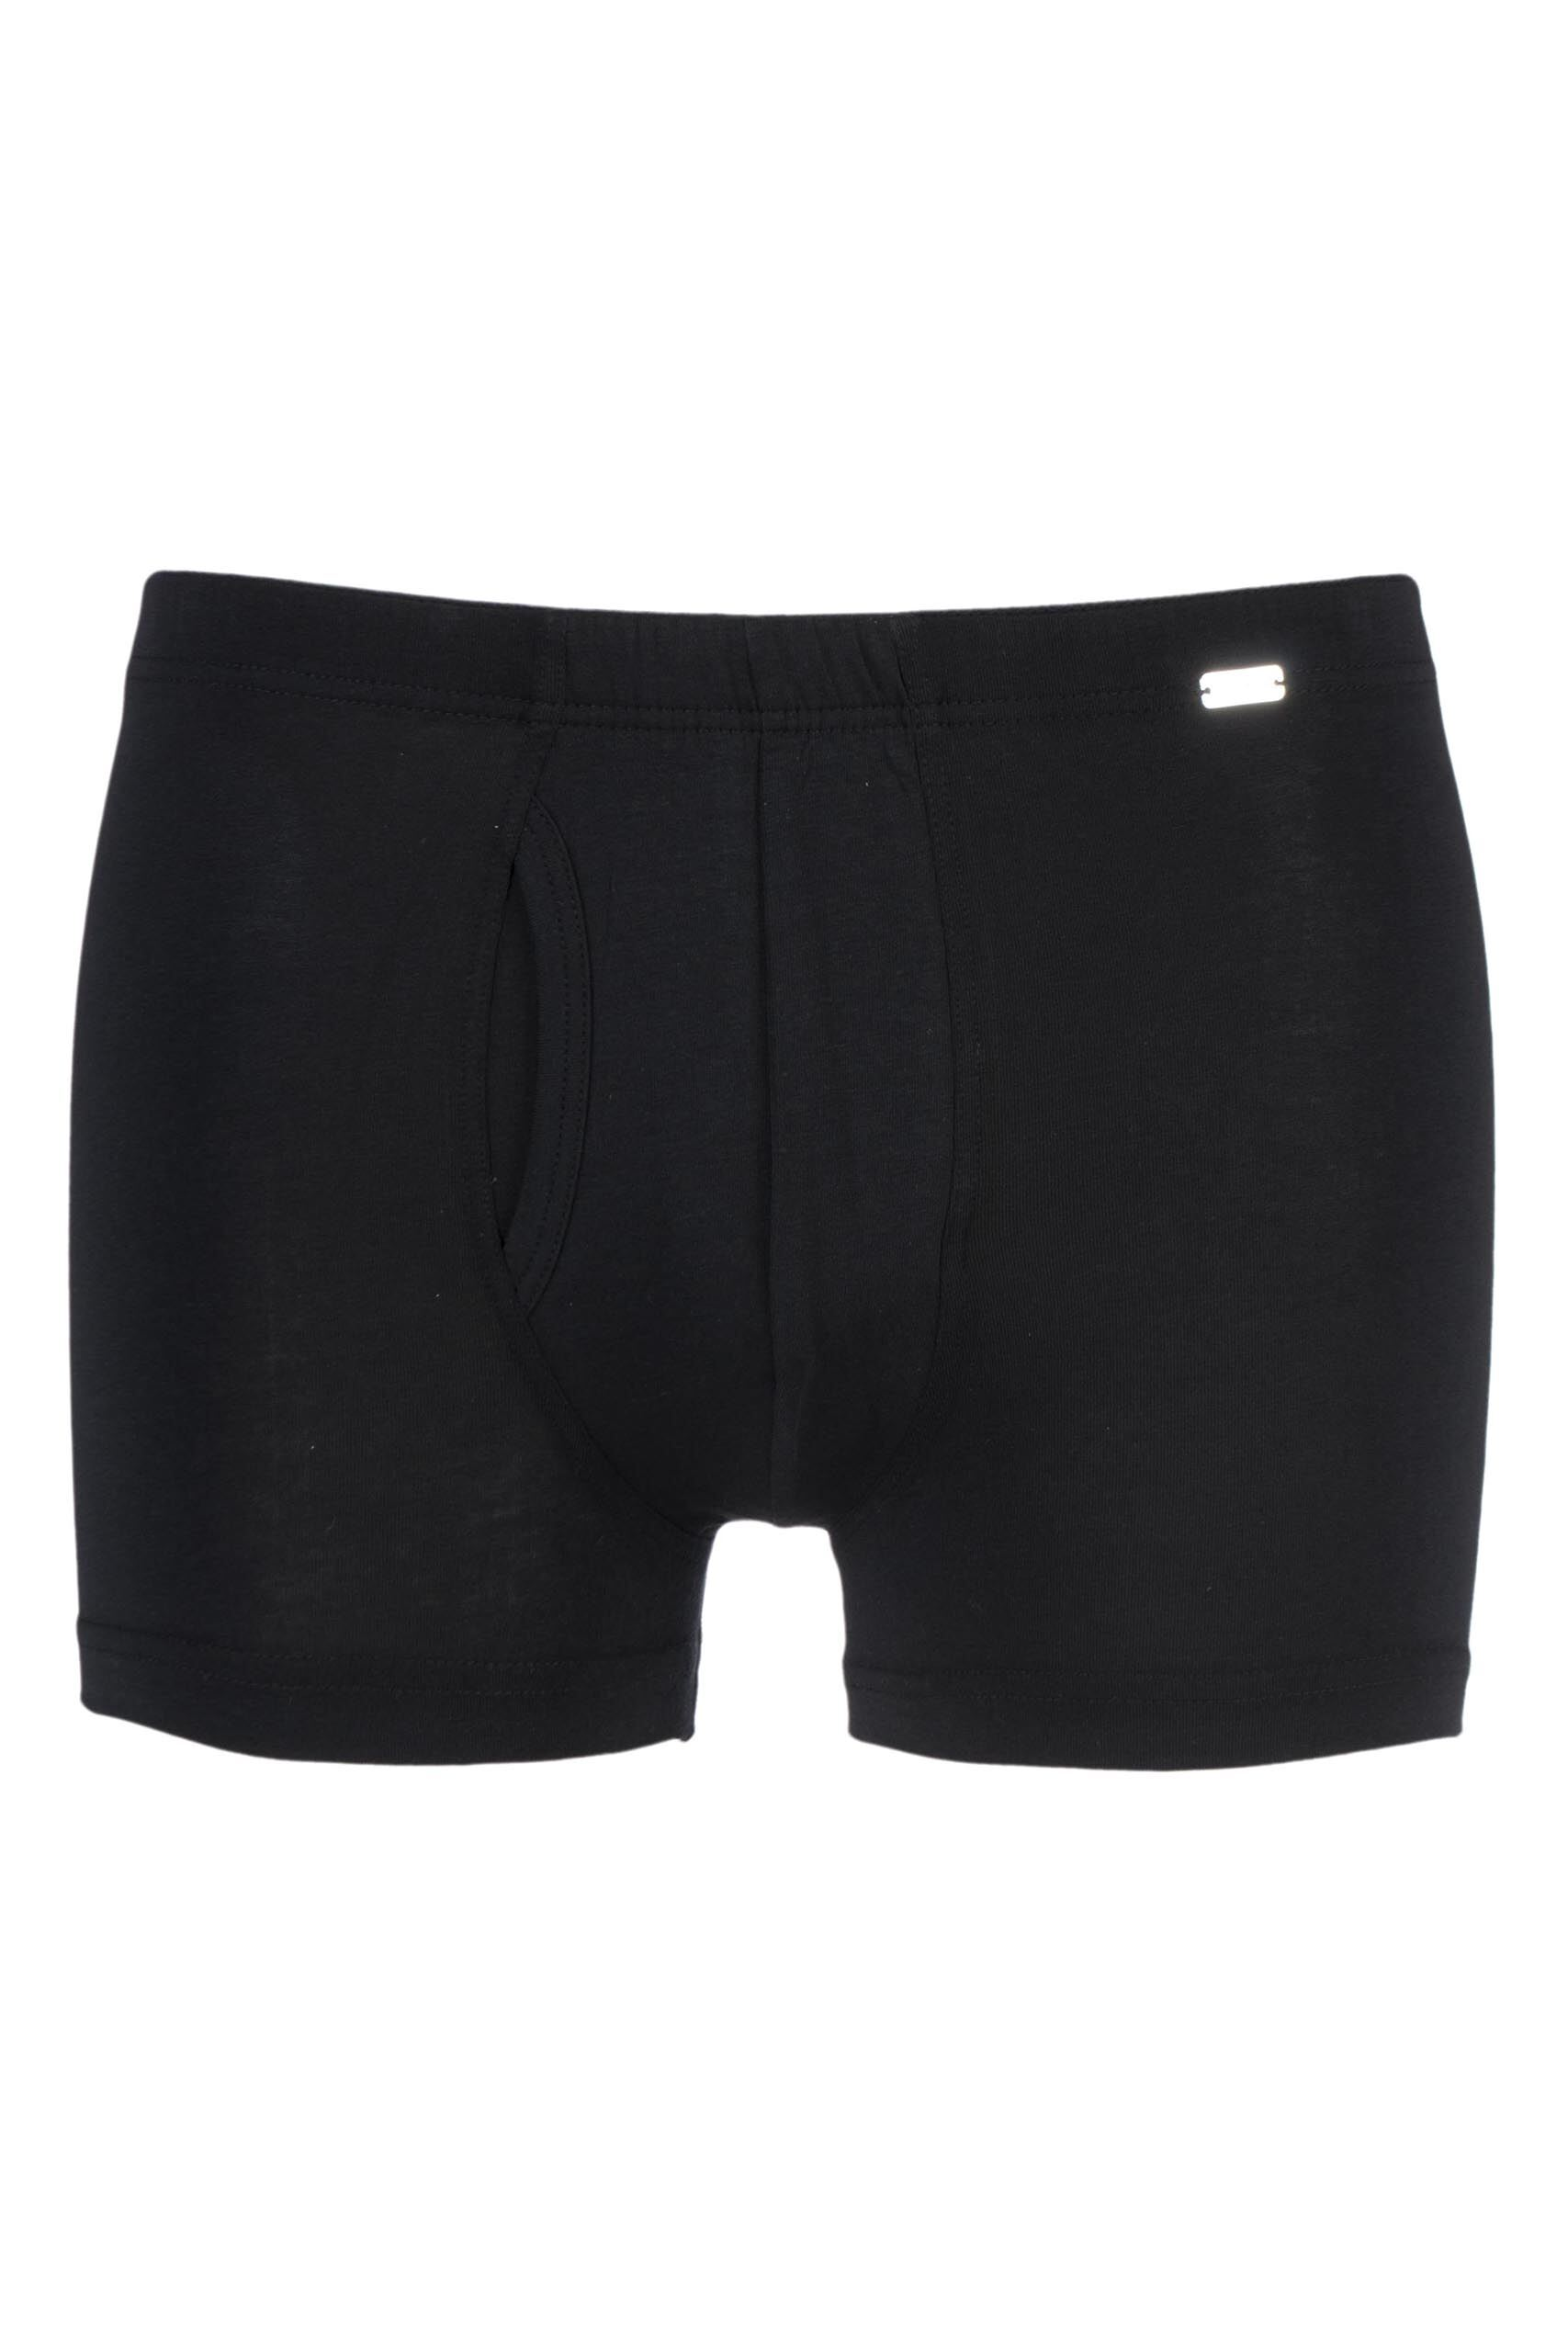 Image of 1 Pack Black Modern Stretch Comfort Trunks Men's XX-Large - Jockey